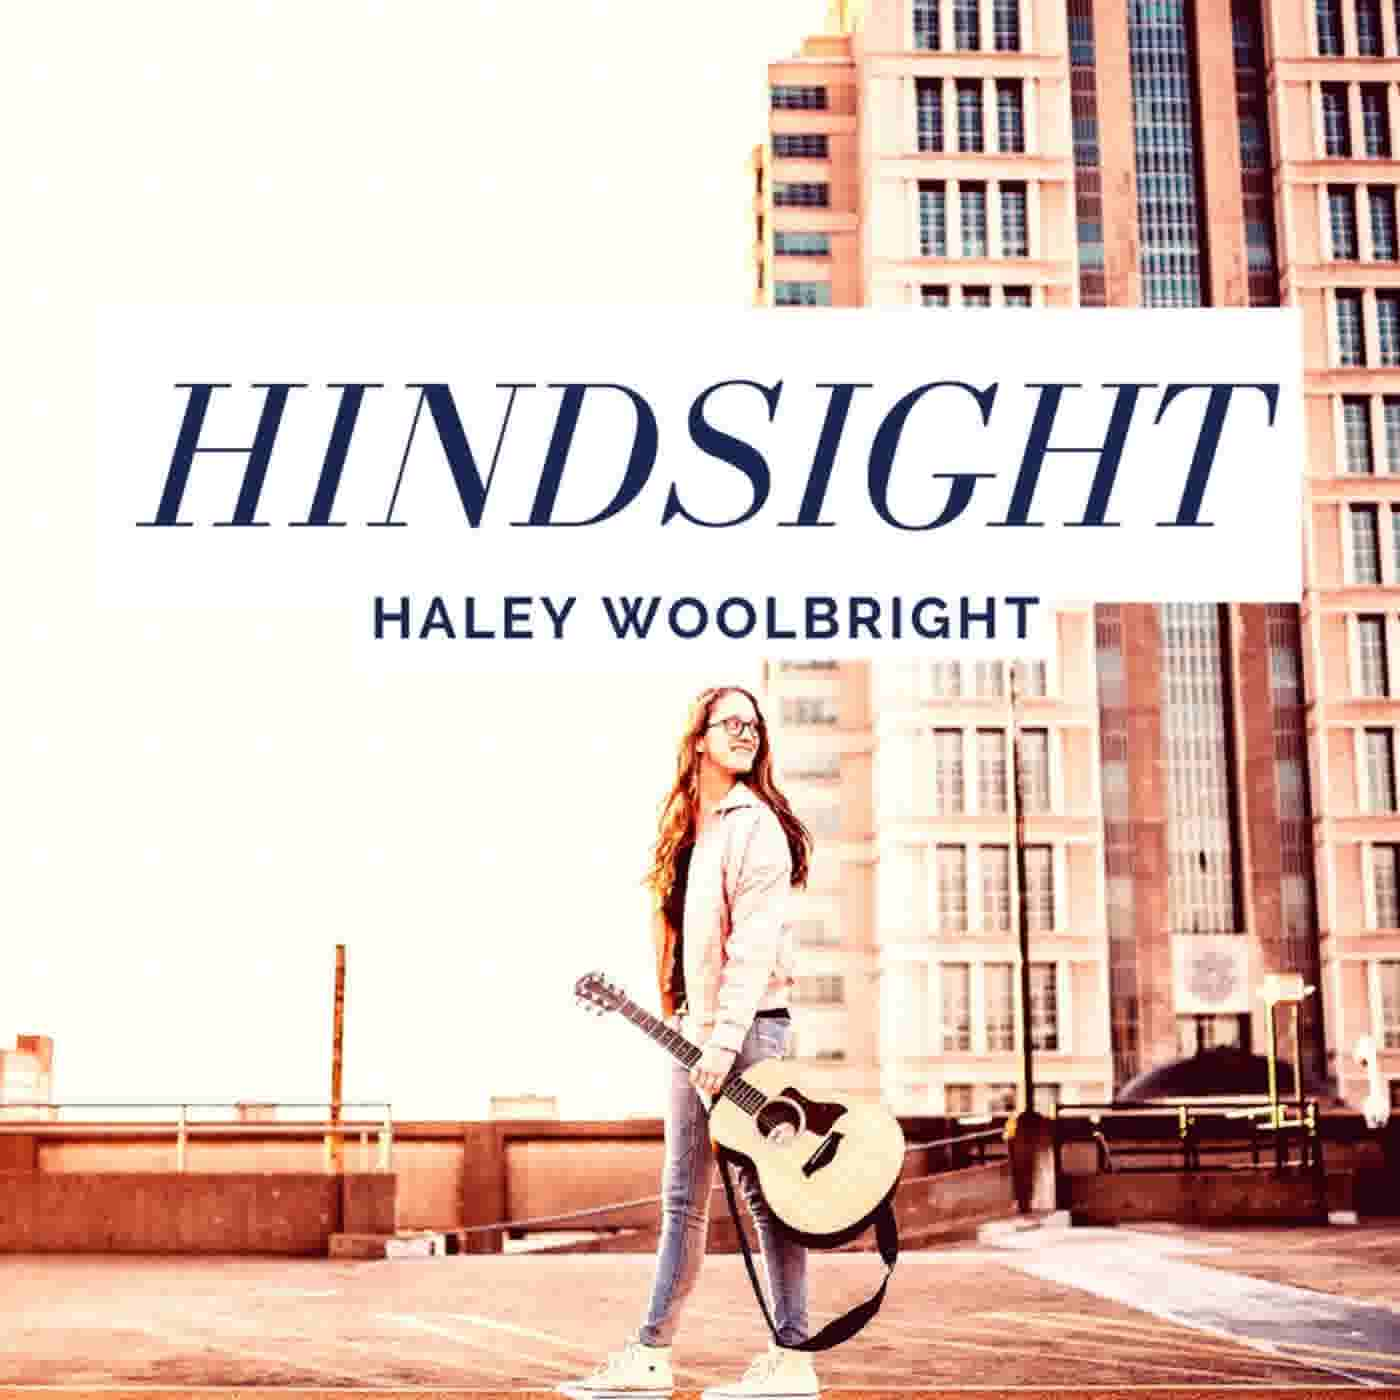 Haley Woolbright